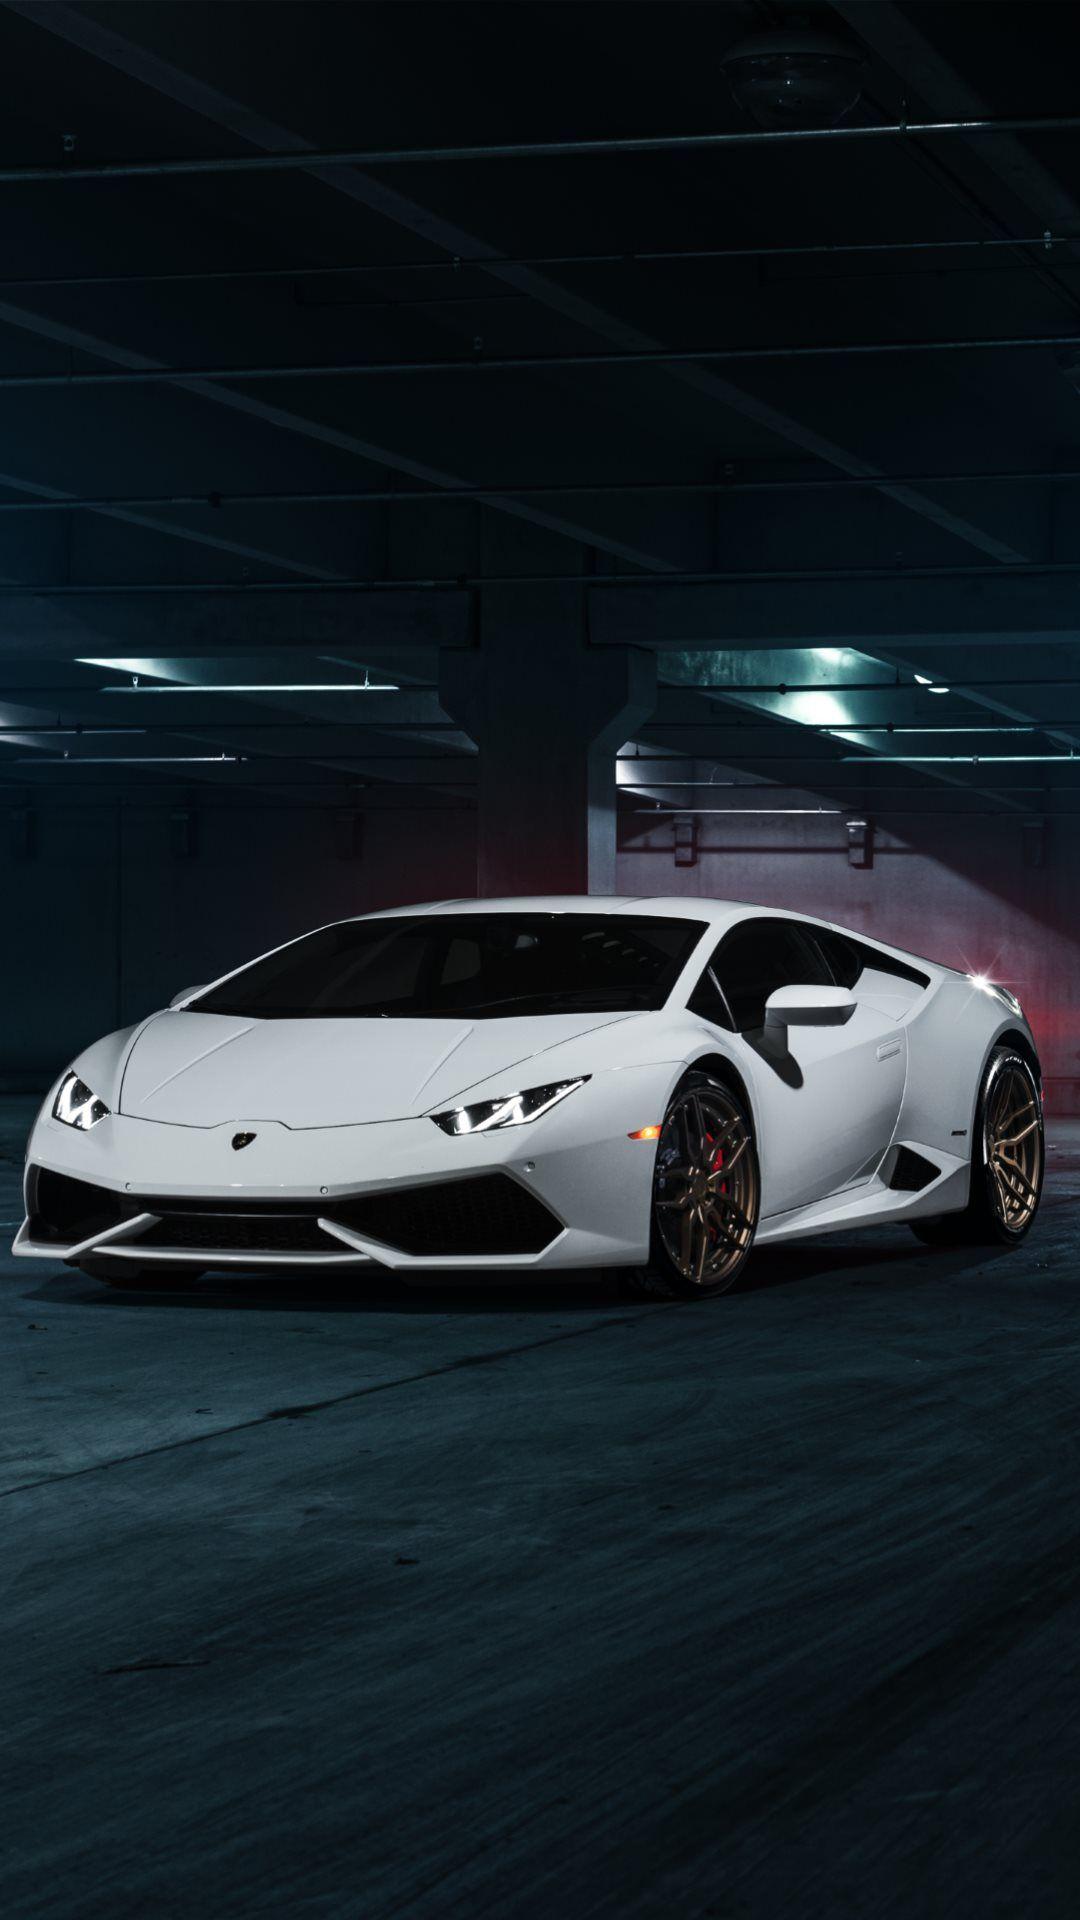 Lamborghini Hd Wallpapers 1080p For Iphone Bestpicture1 Org